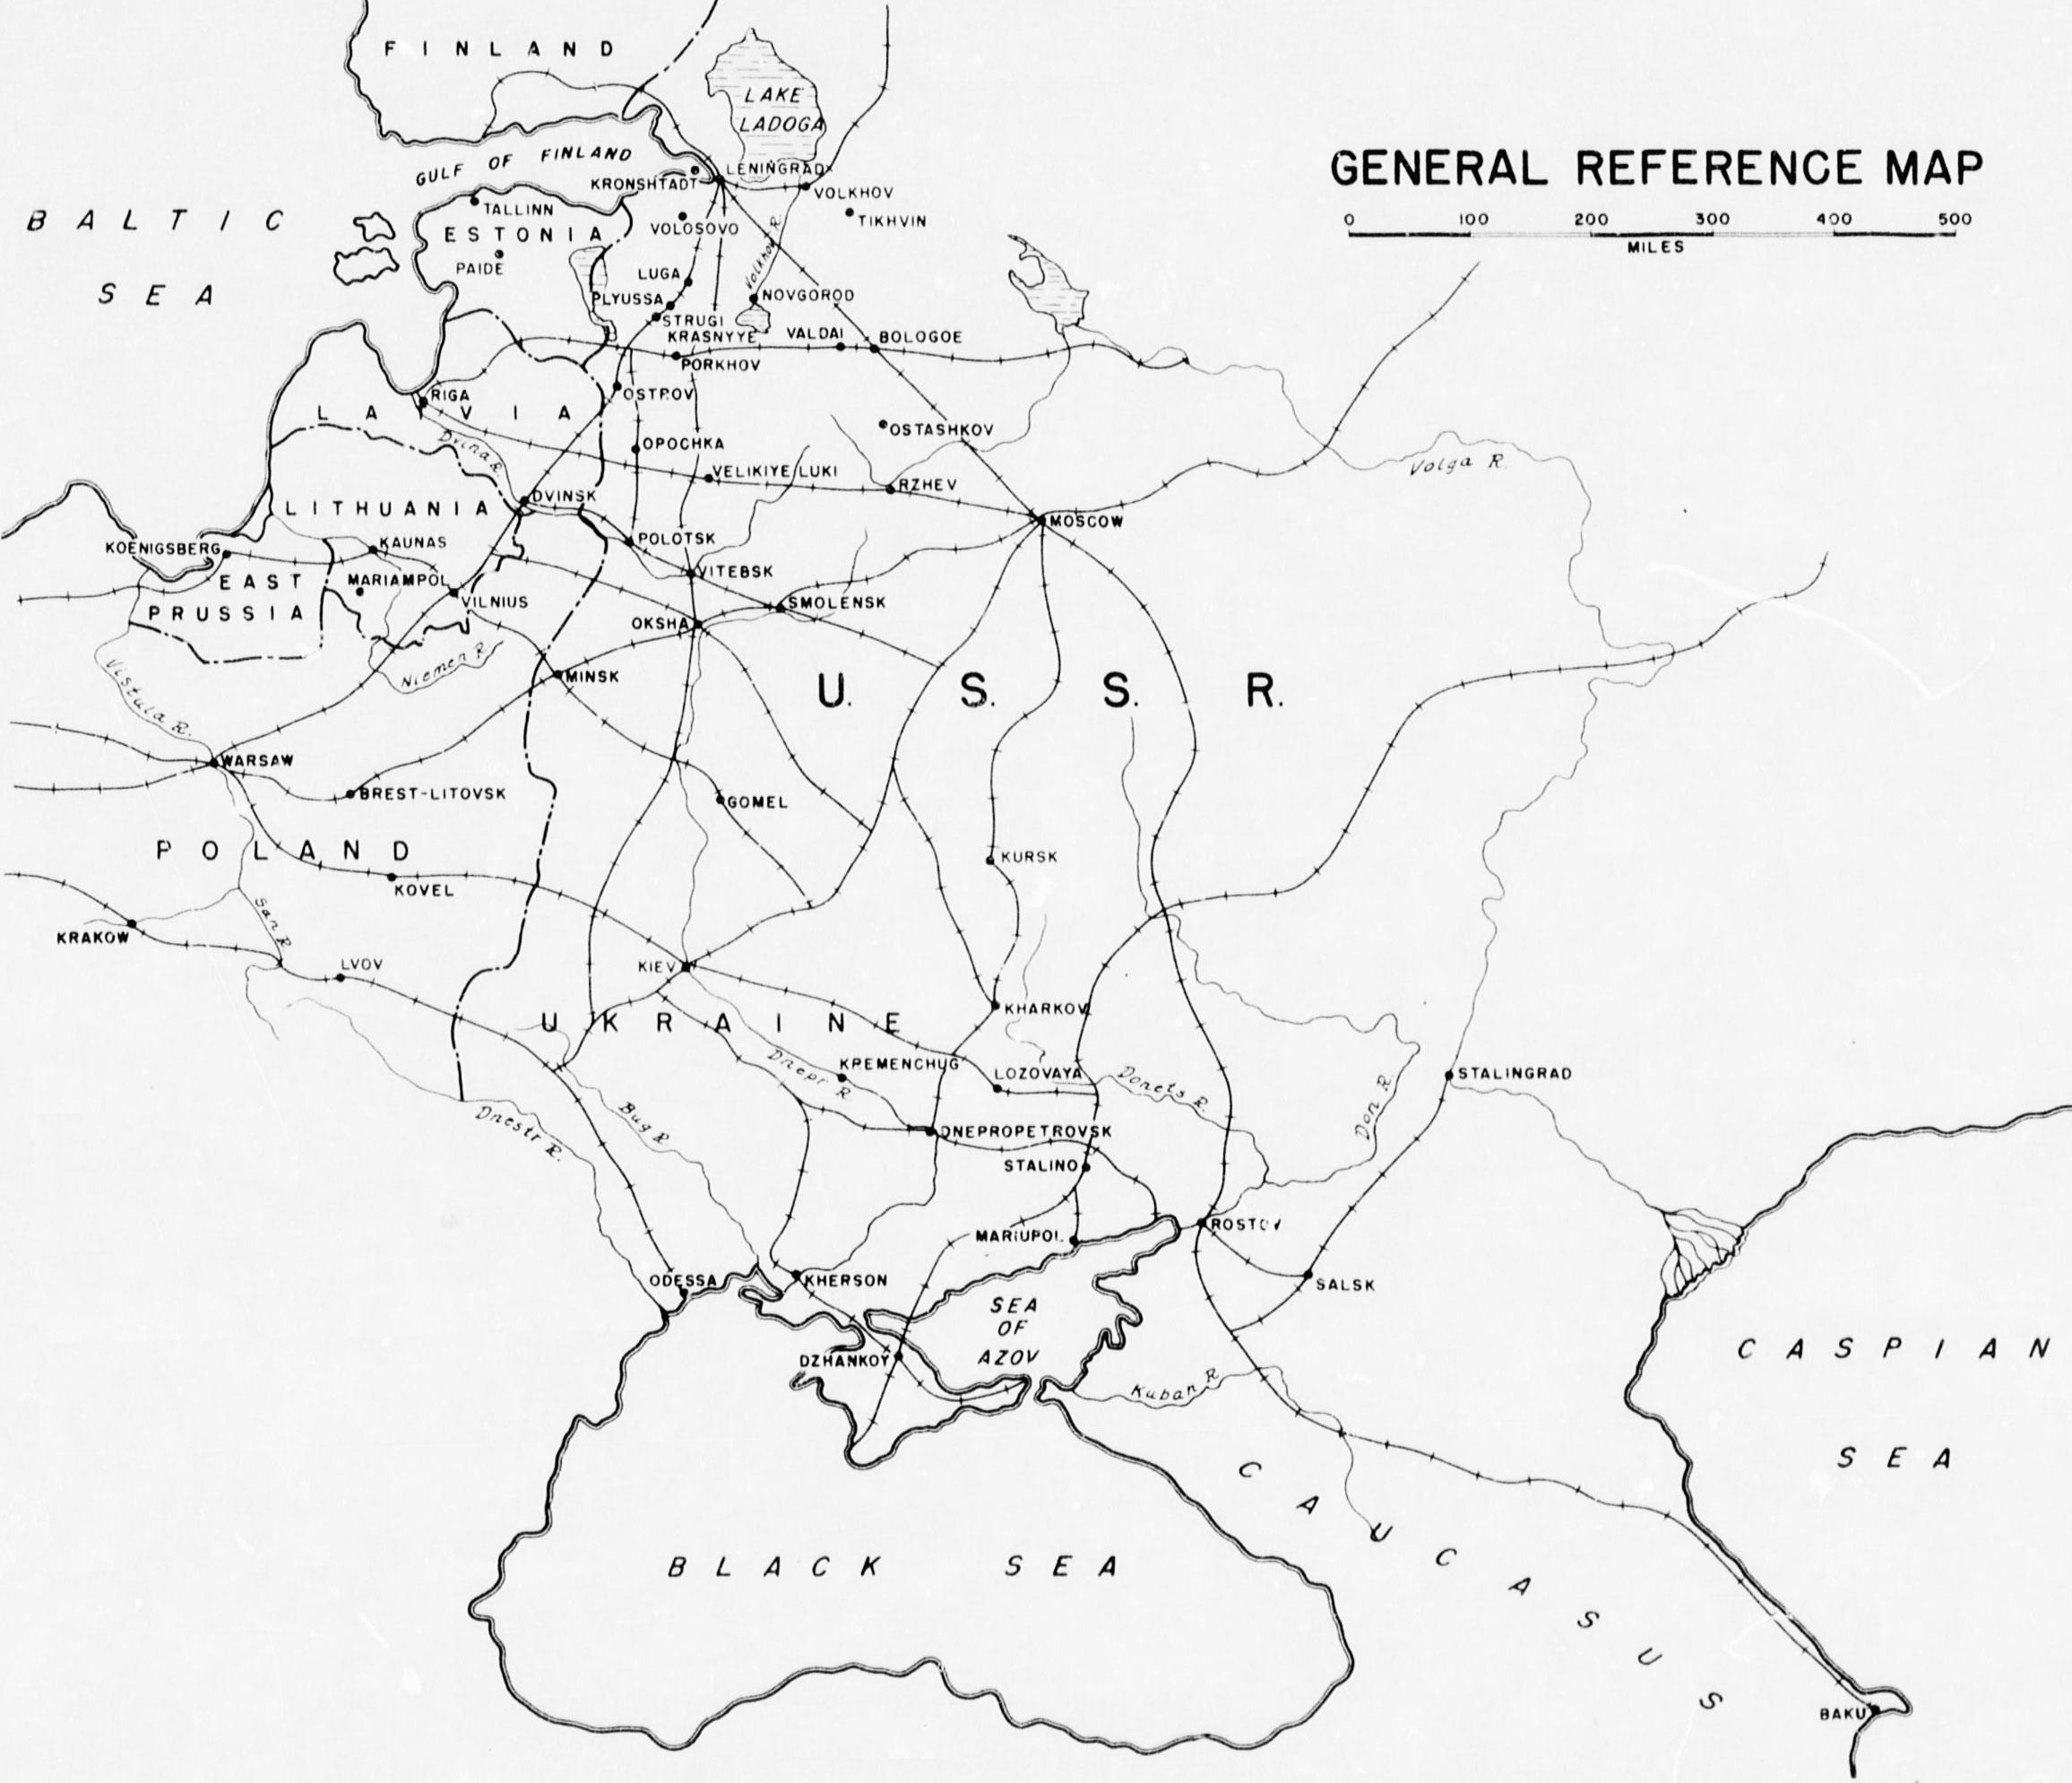 All world wars